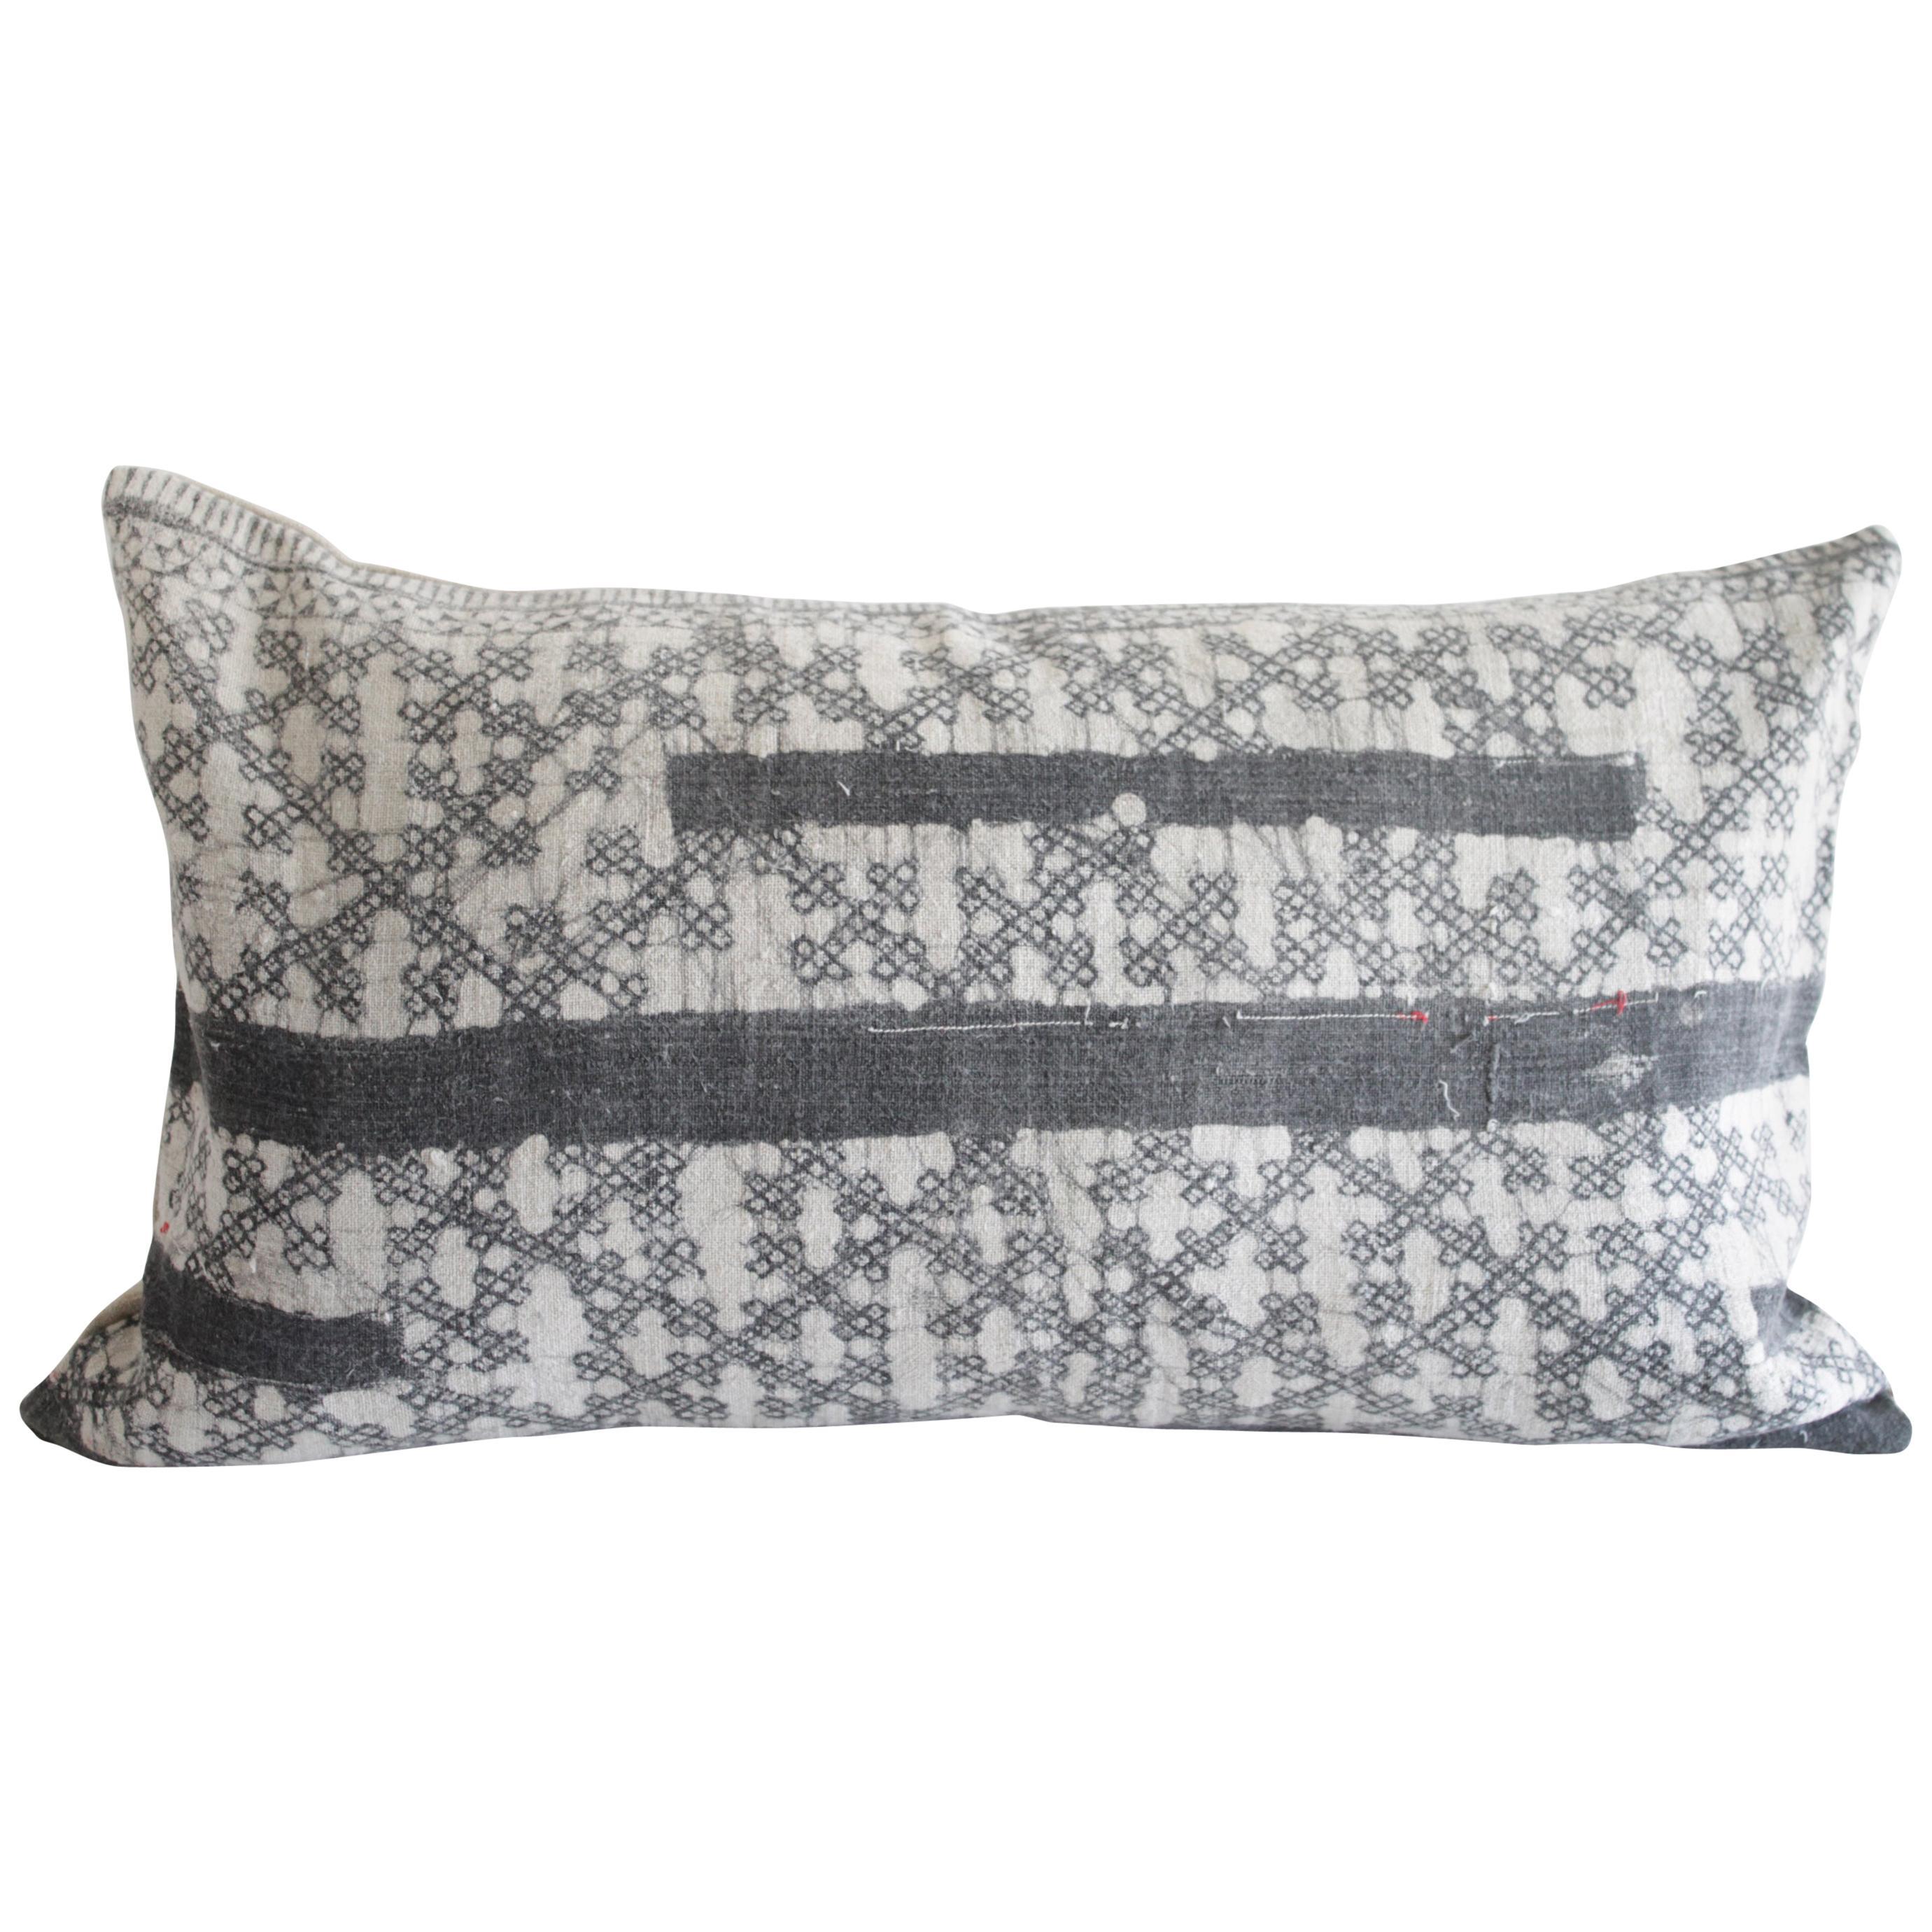 Vintage Batik Accent Pillow in Dark Grey Black with Natural Linen